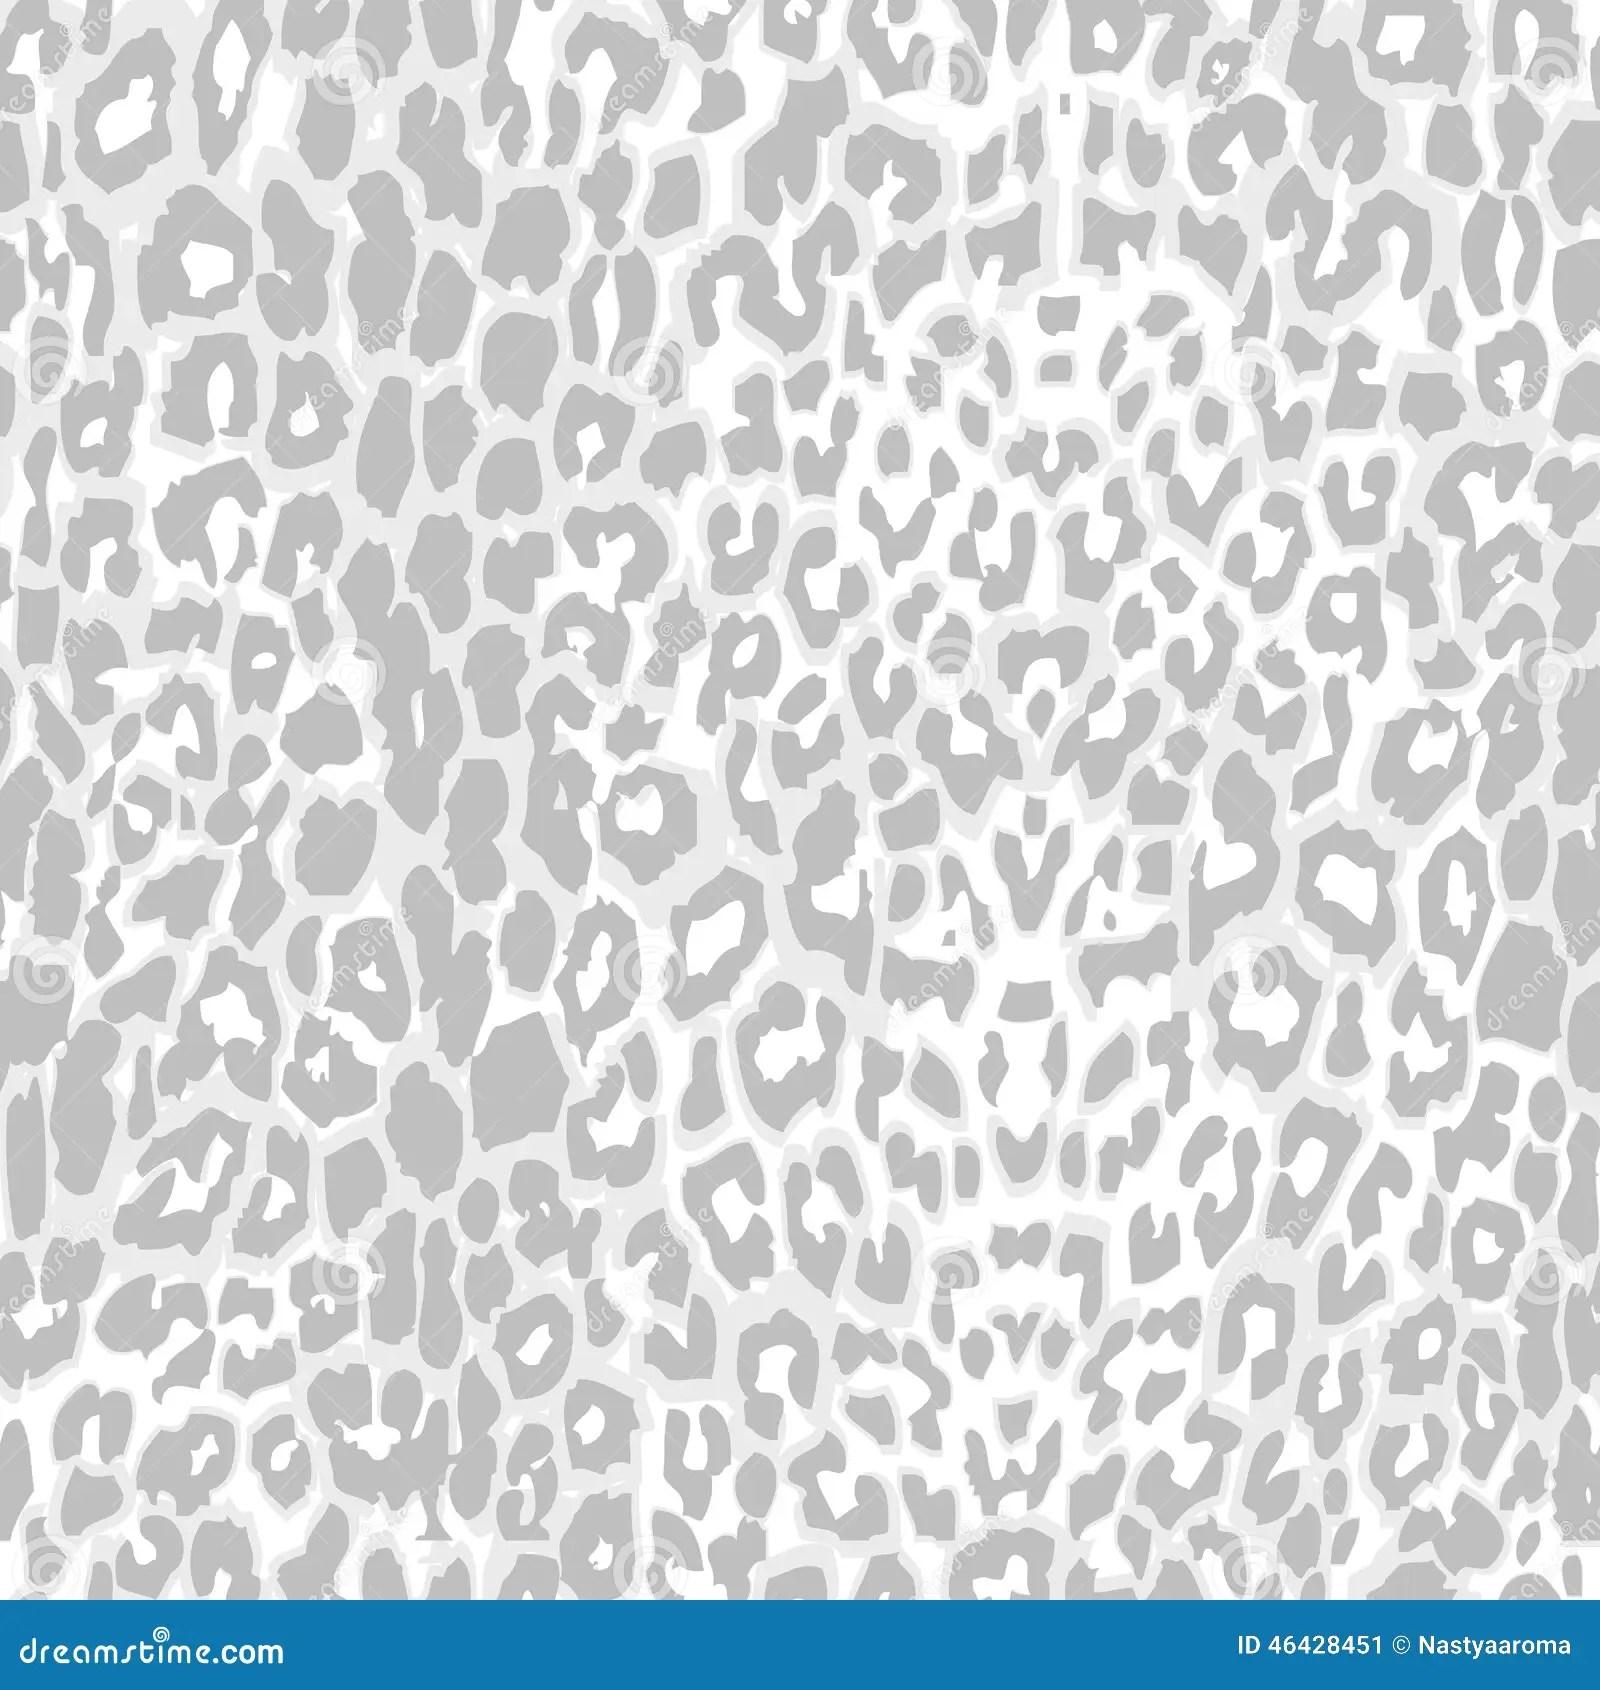 Neon Animal Print Wallpaper Leopard Print Pattern Gray Scale Vector Stock Vector